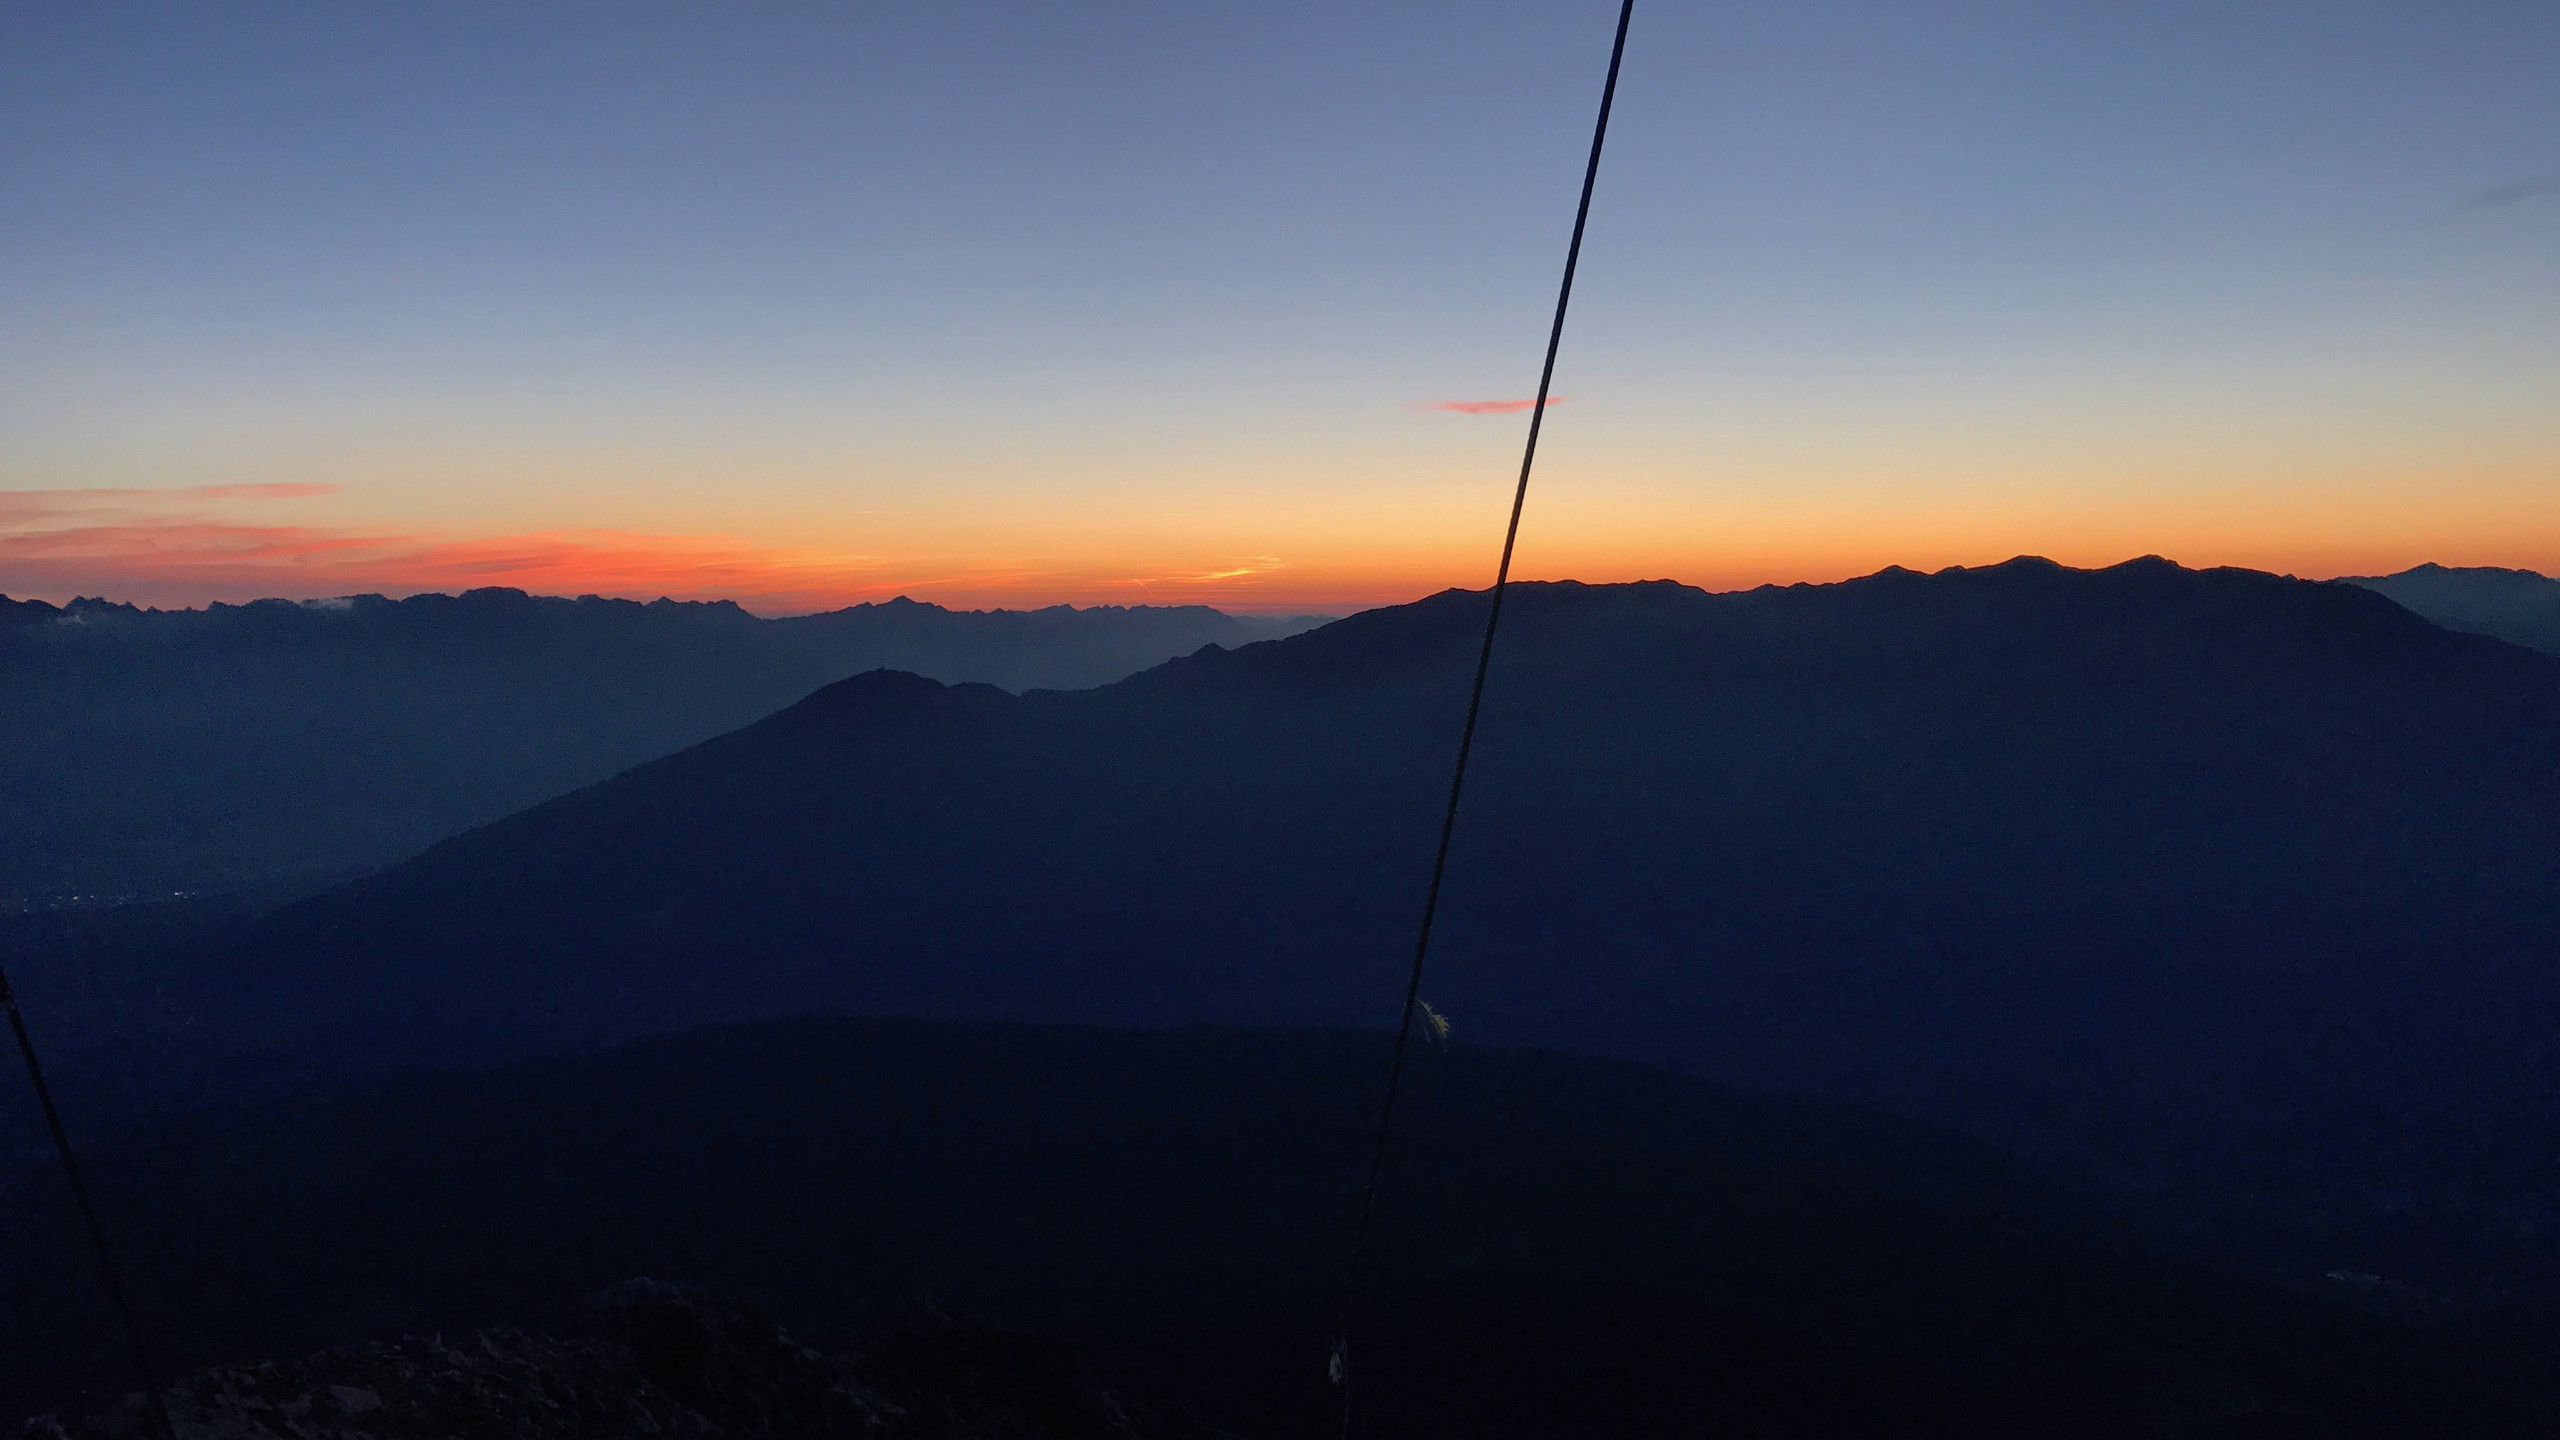 Sonnenaufgang beginnt, Sonnenaufgangstour Serles